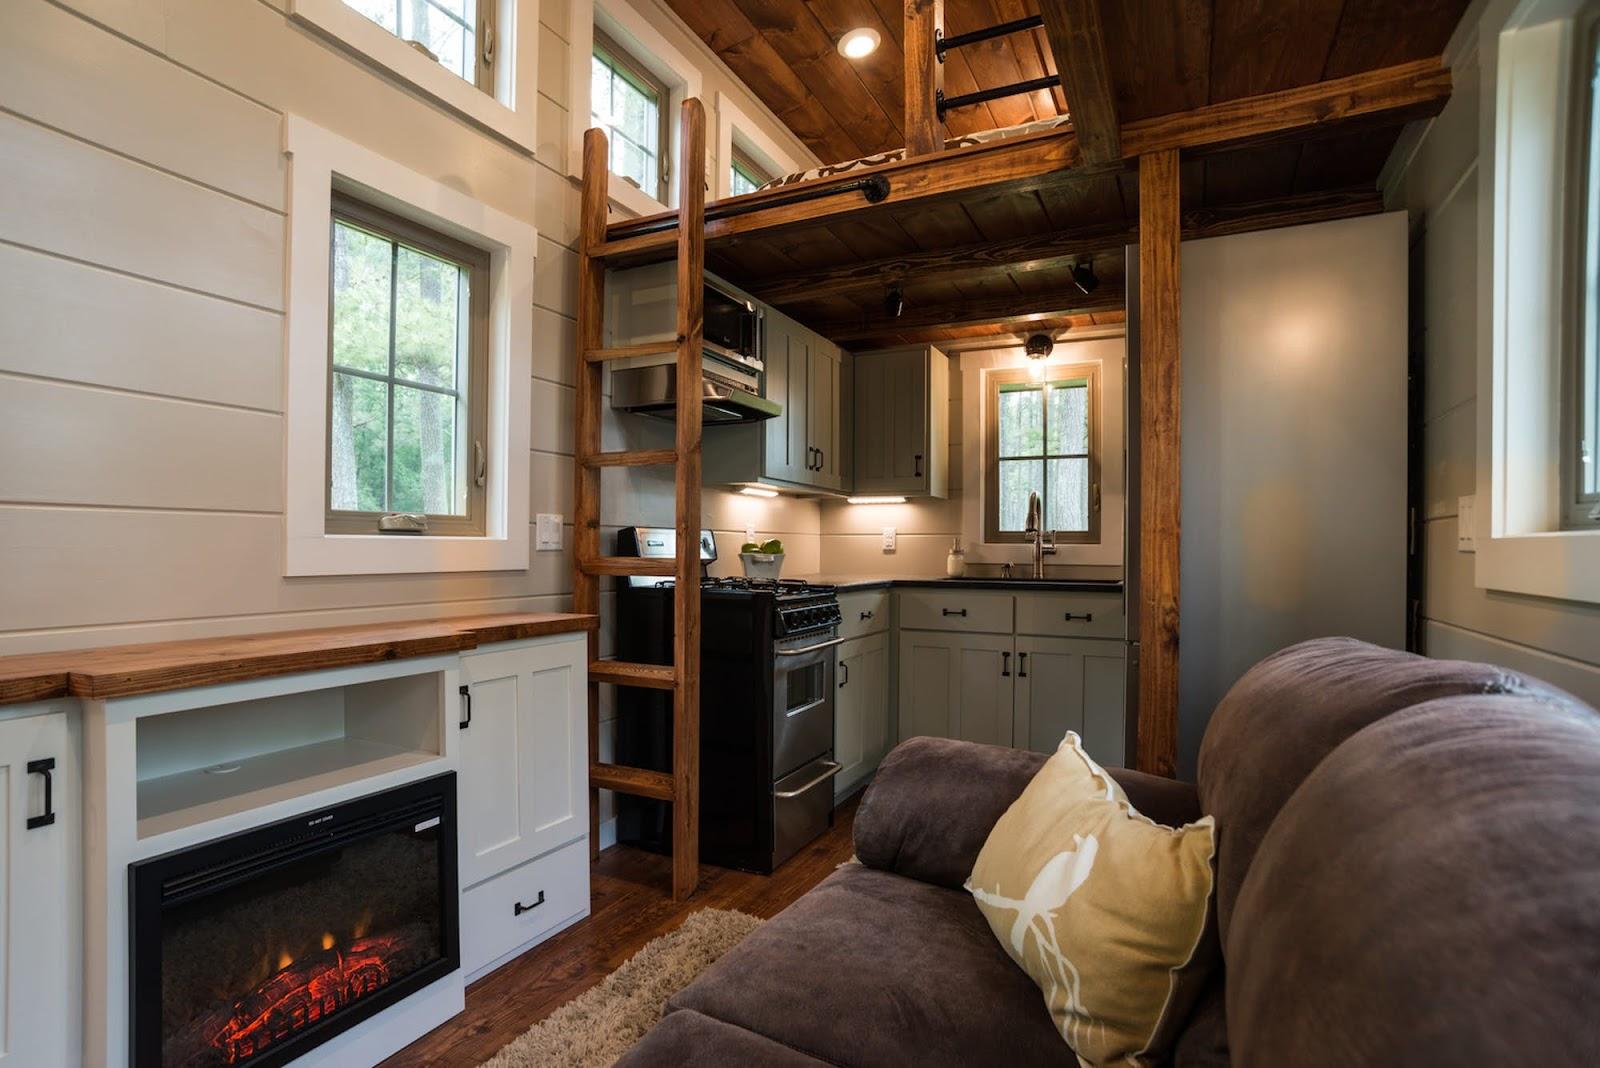 Harvard Designed Tiny Homes: TINY HOUSE TOWN: The Retreat From Timbercraft Tiny Homes